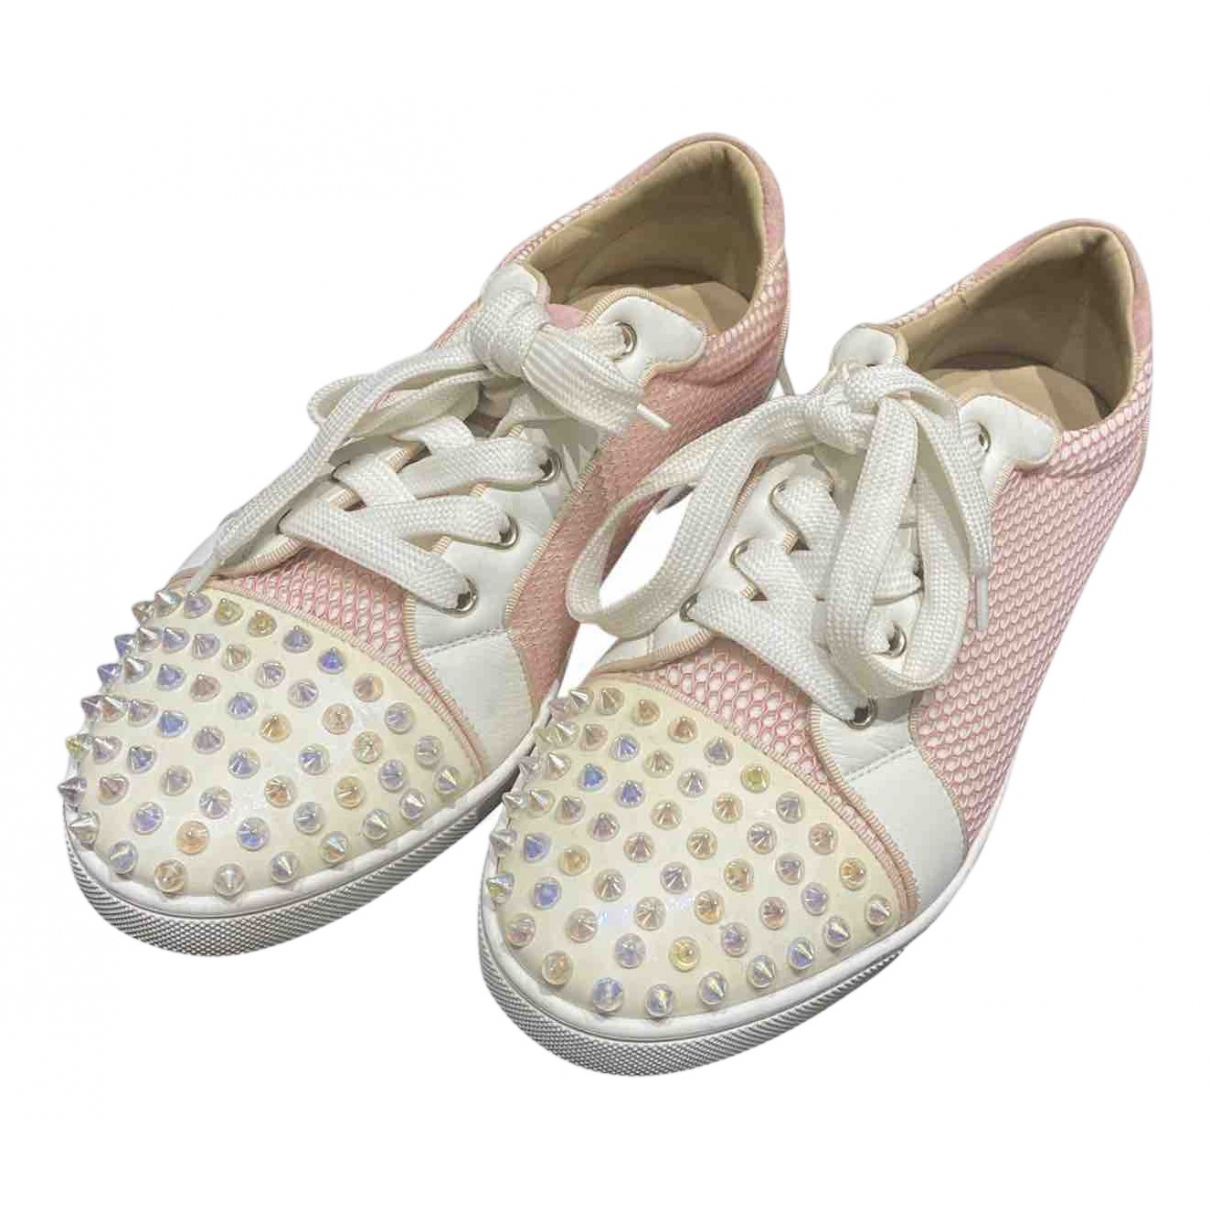 Christian Louboutin Gondolita Pink Cloth Trainers for Women 40.5 EU